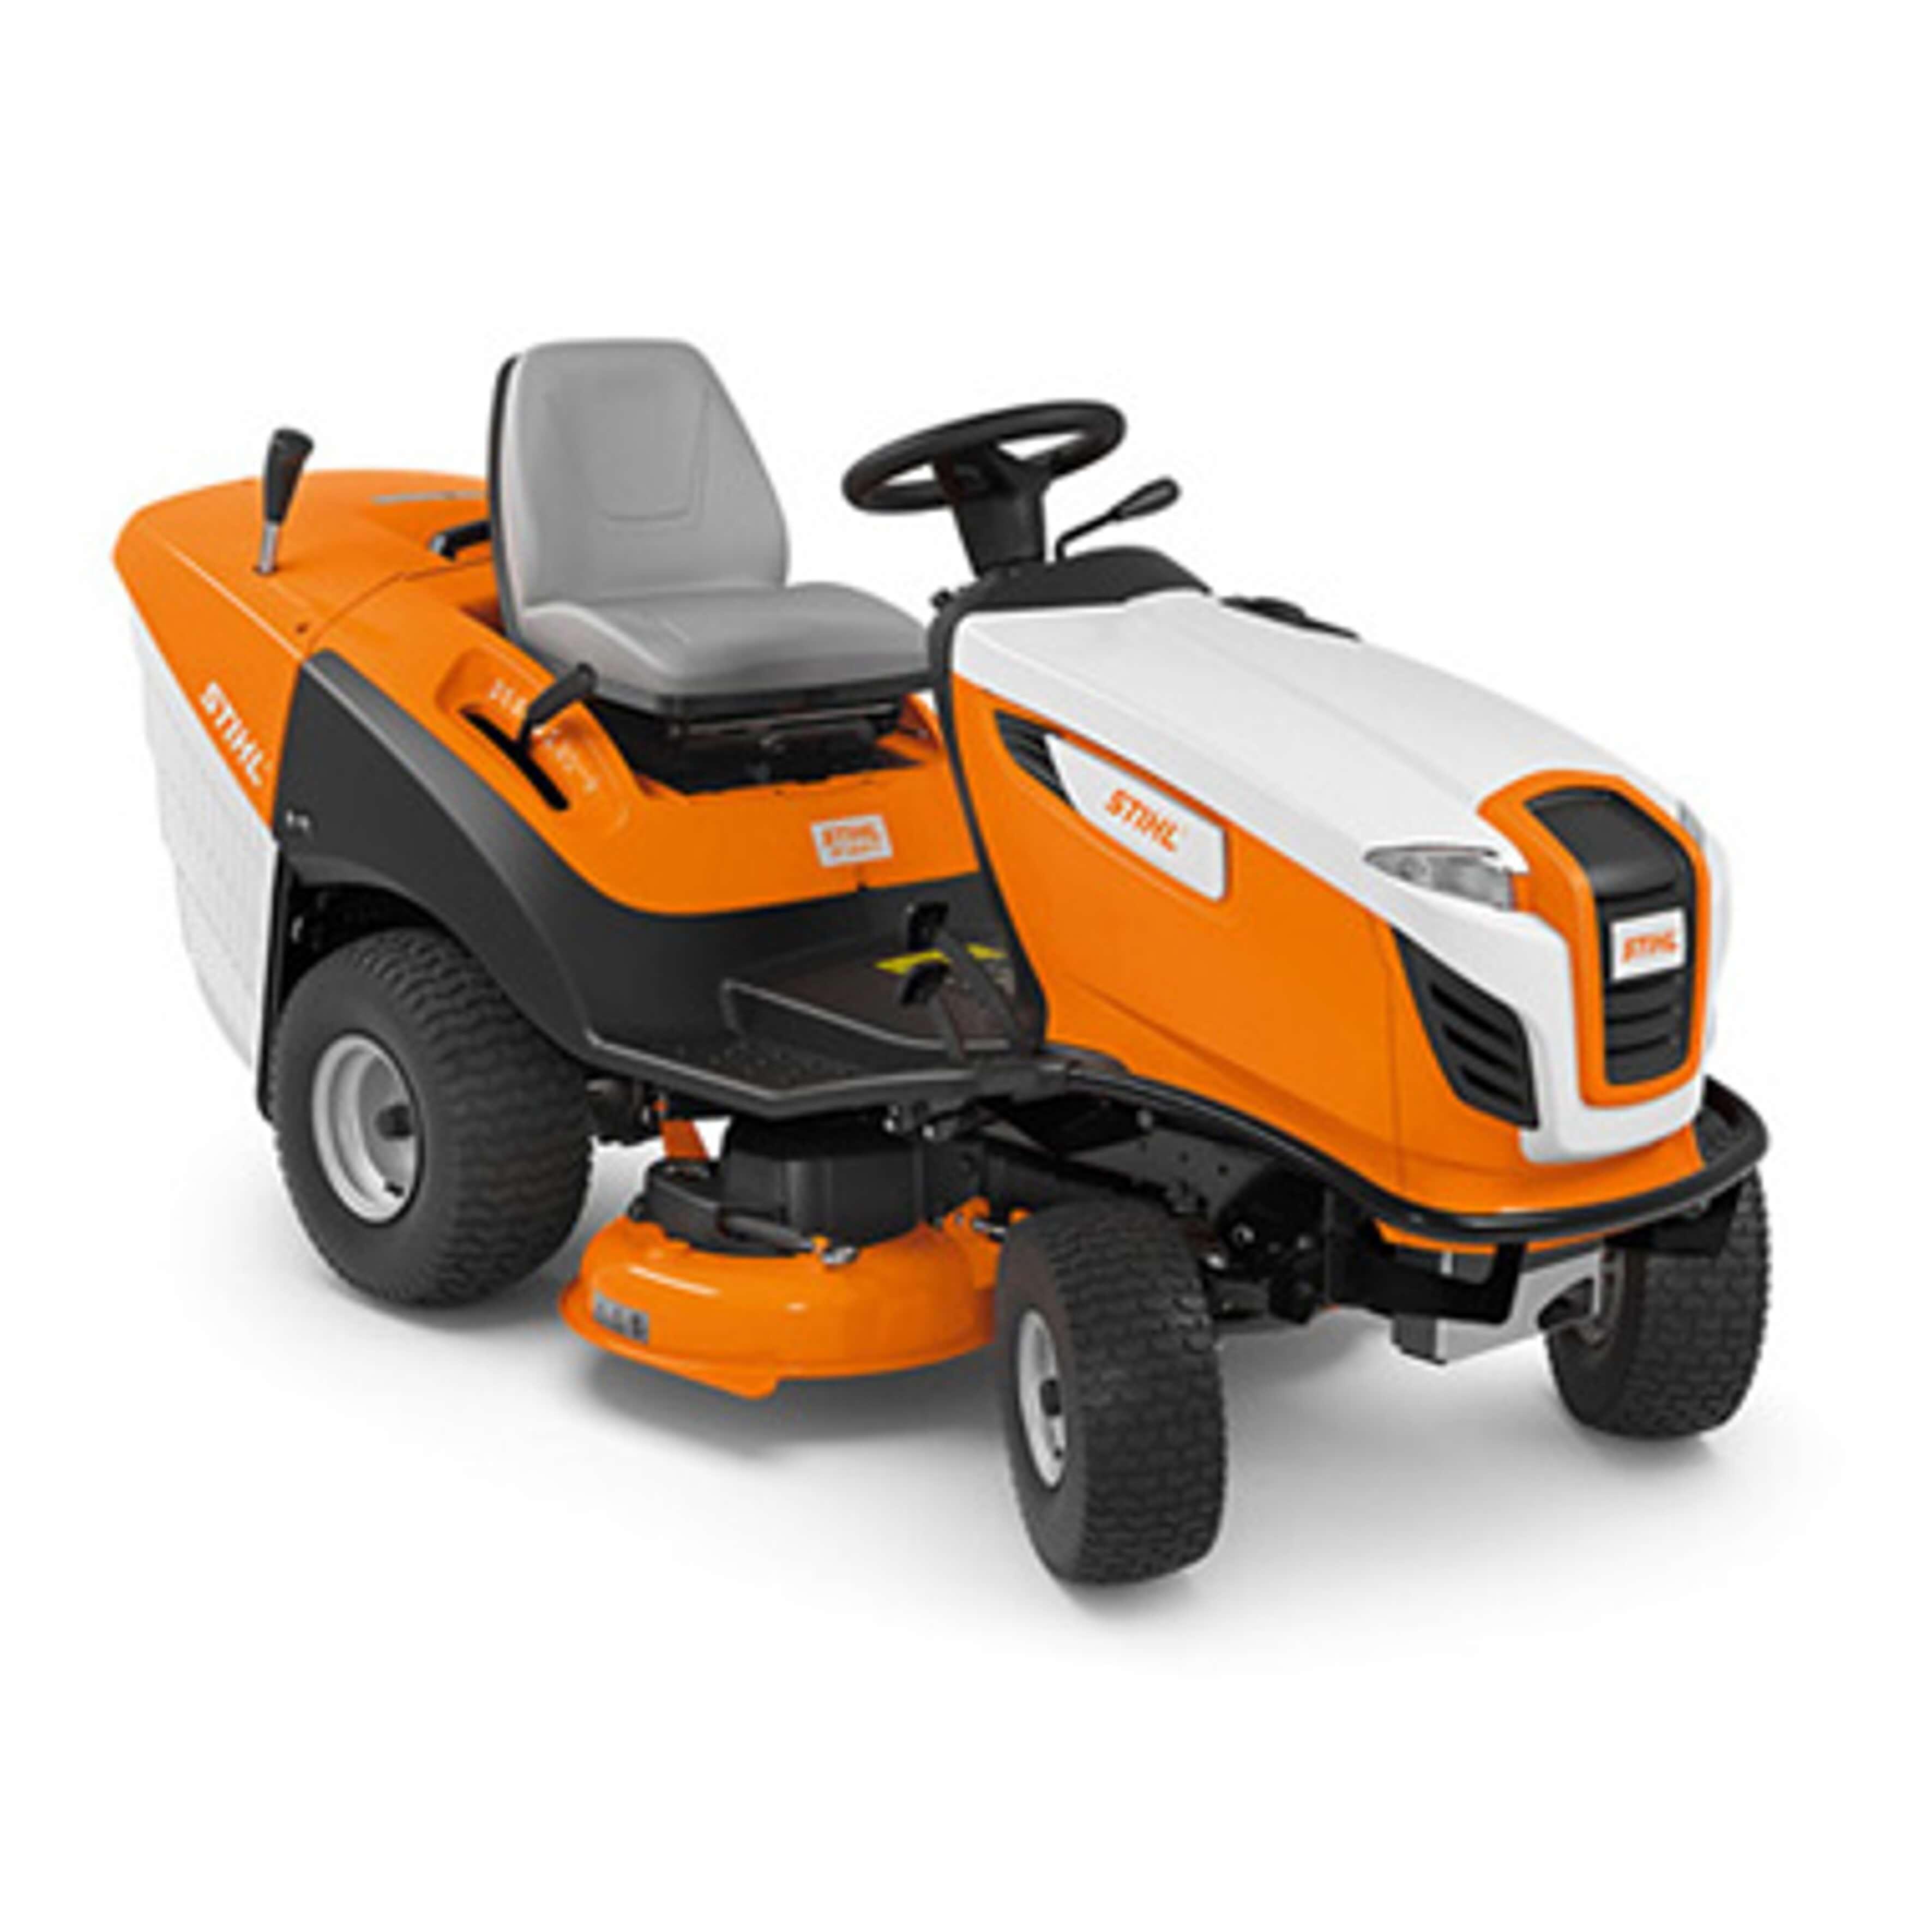 Stihl T5 Series Ride on Mower Parts